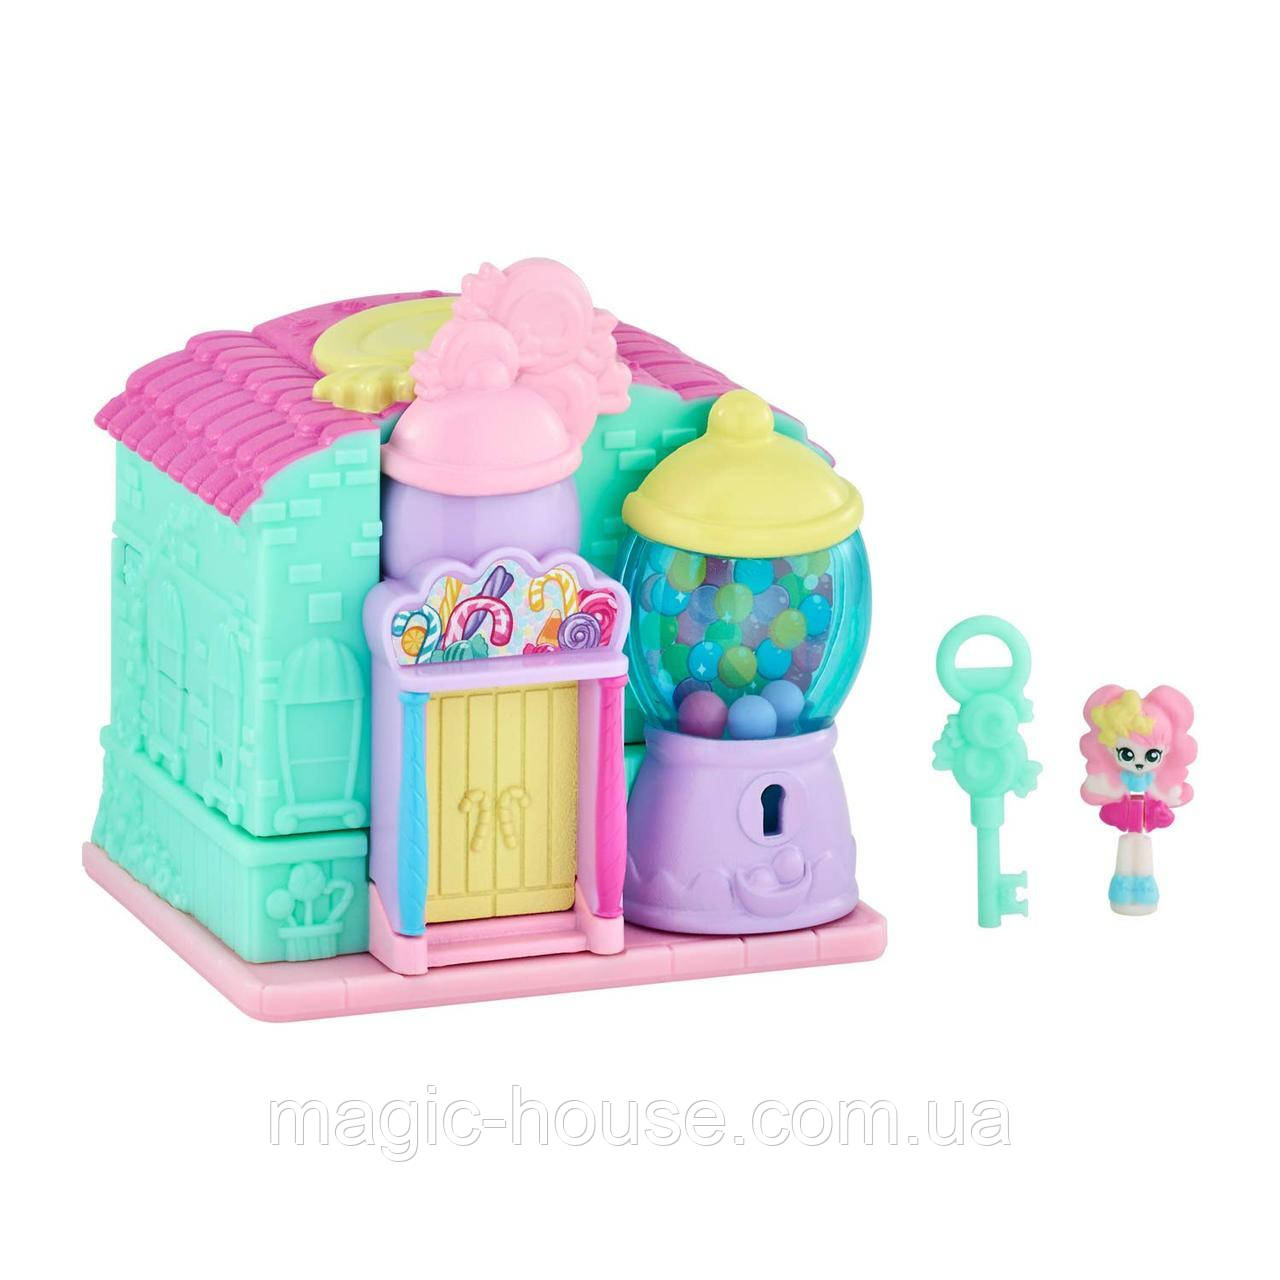 ShopkinsШопкинс миниСекретныйМагазин Сладостей Lil Secrets Mini Playset Sweet Retreat Candy